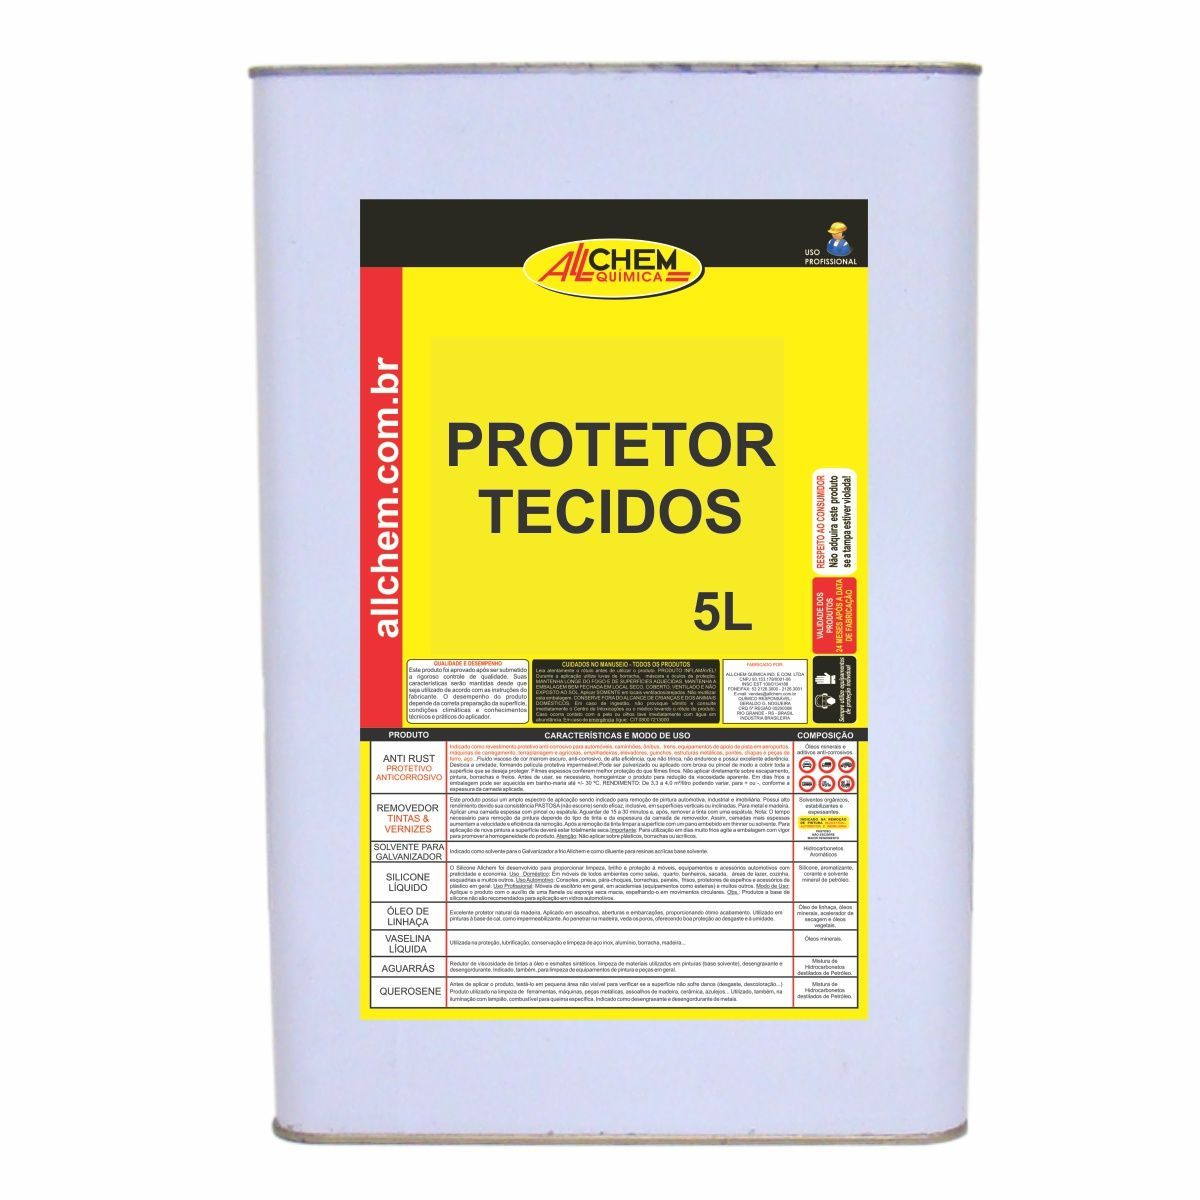 protetor-tecidos-allchem